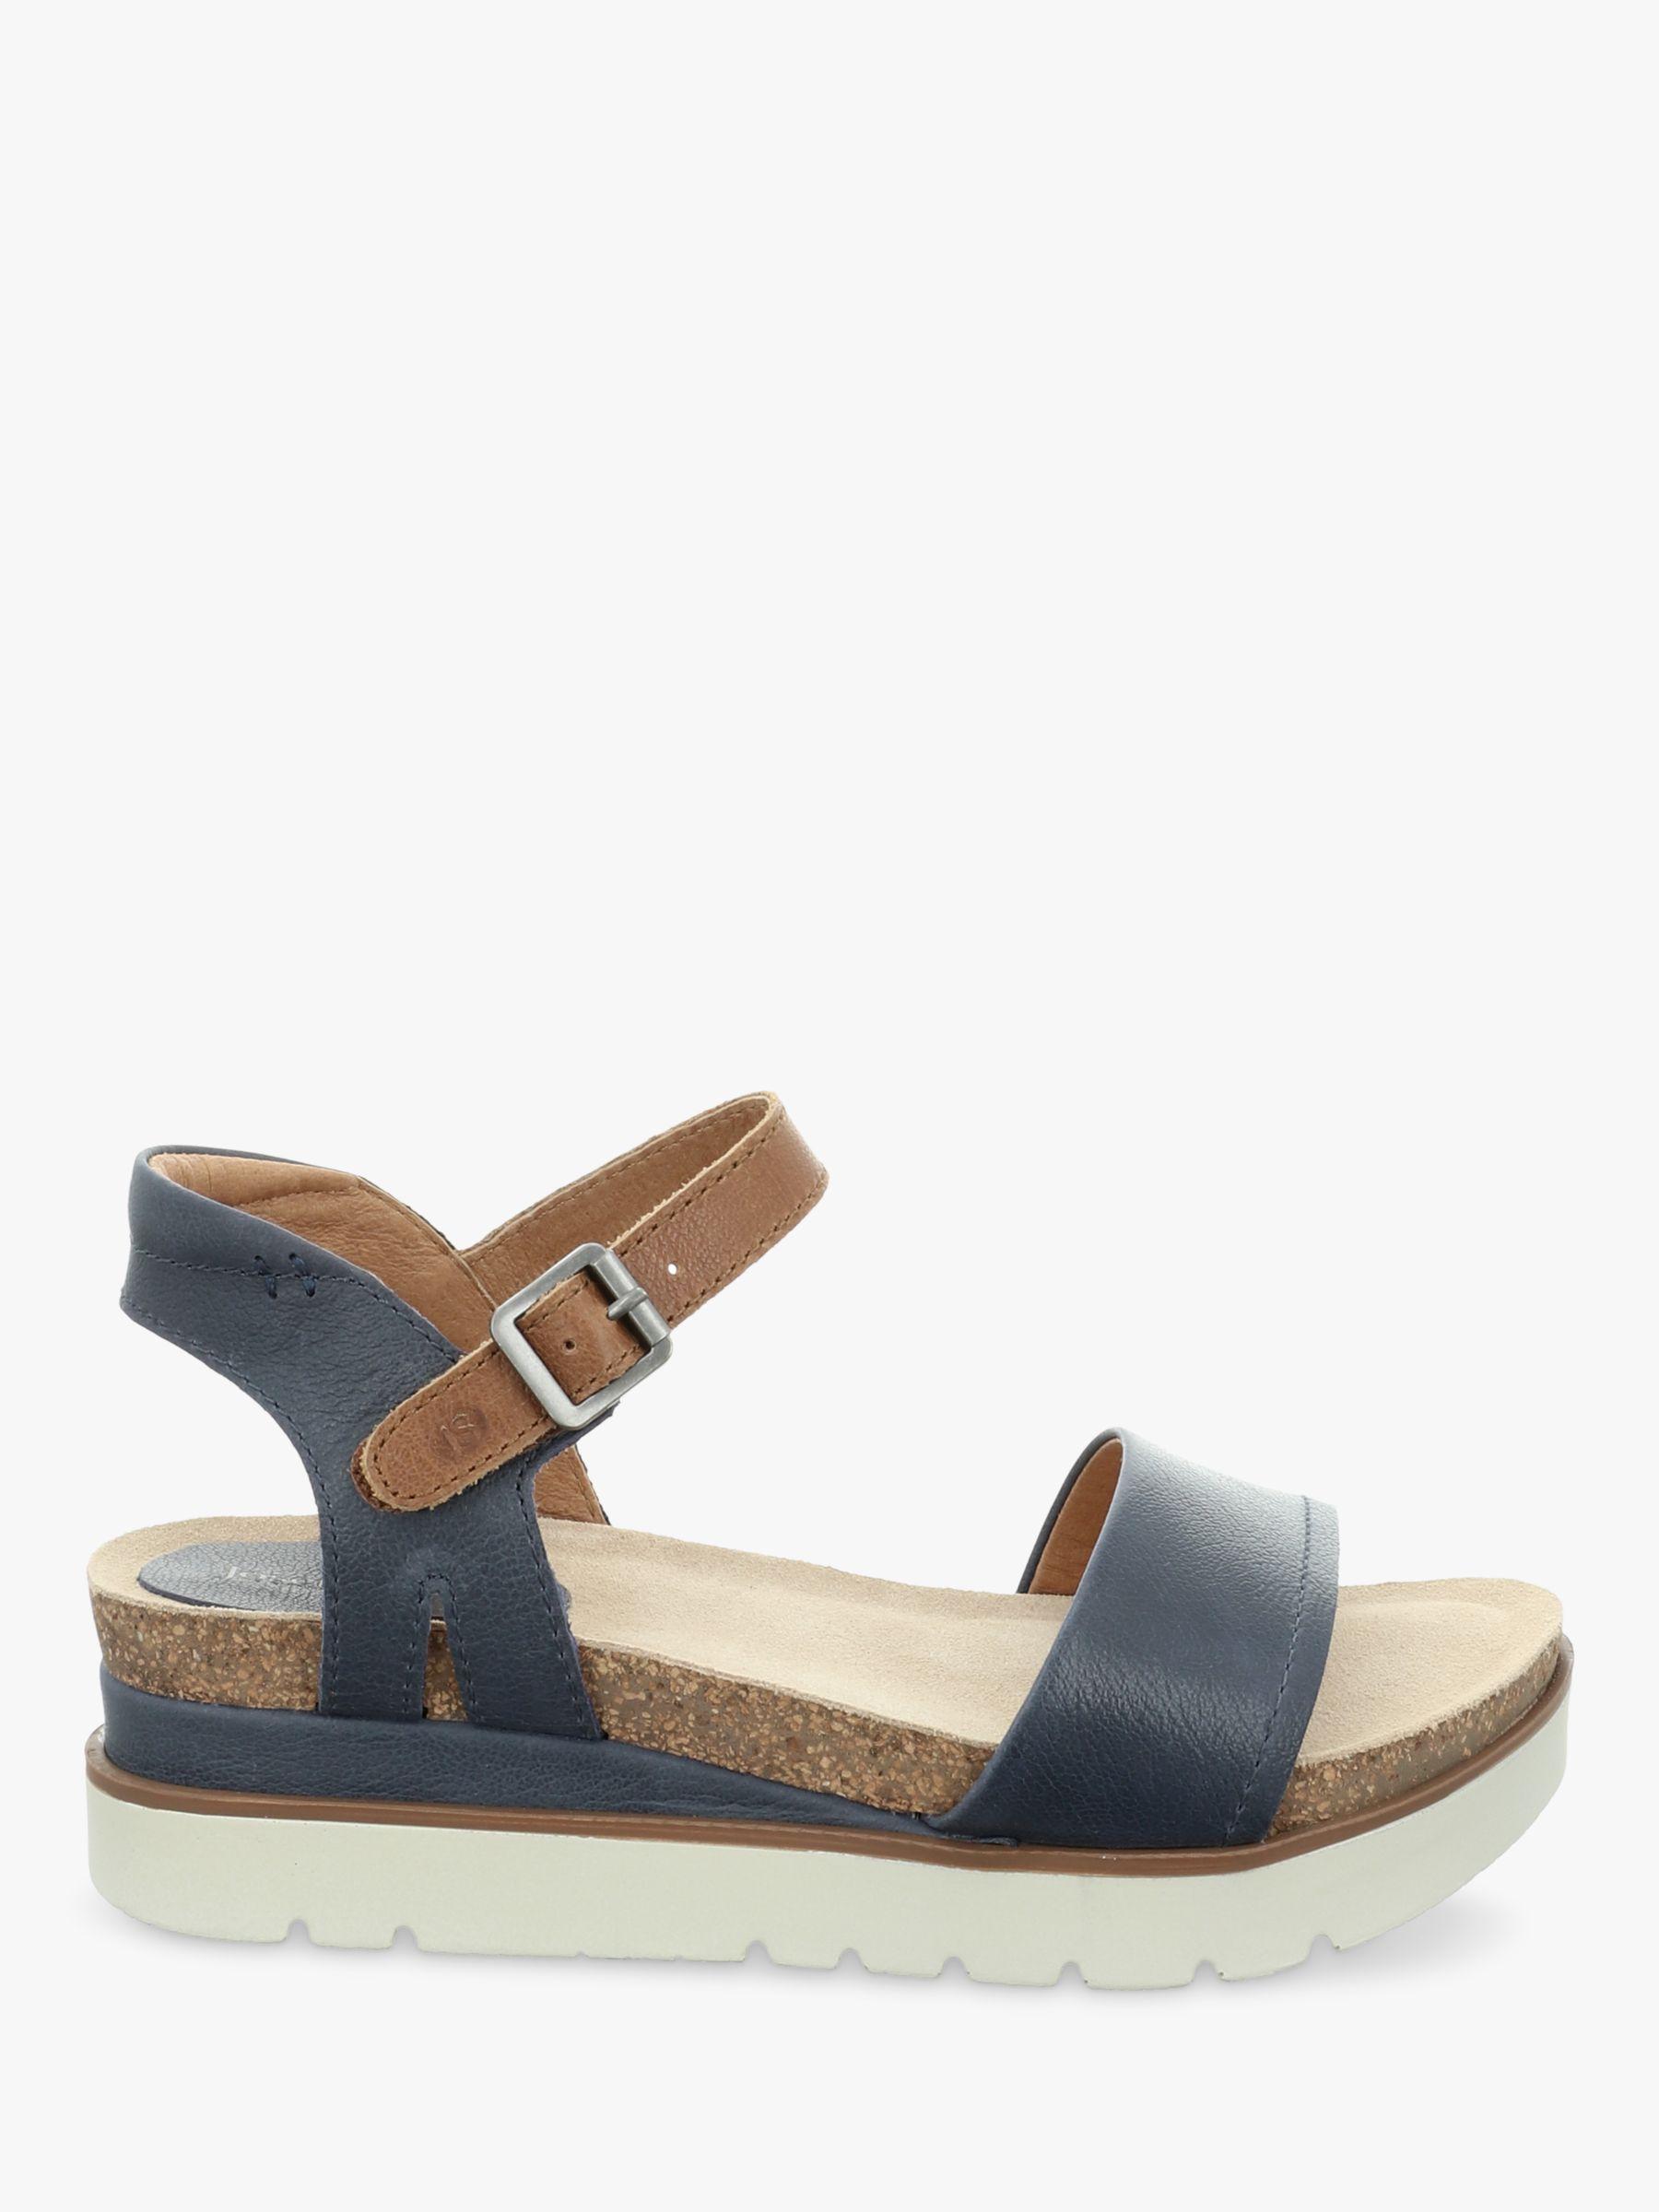 Josef Seibel Josef Seibel Clea 01 Strap Sandals